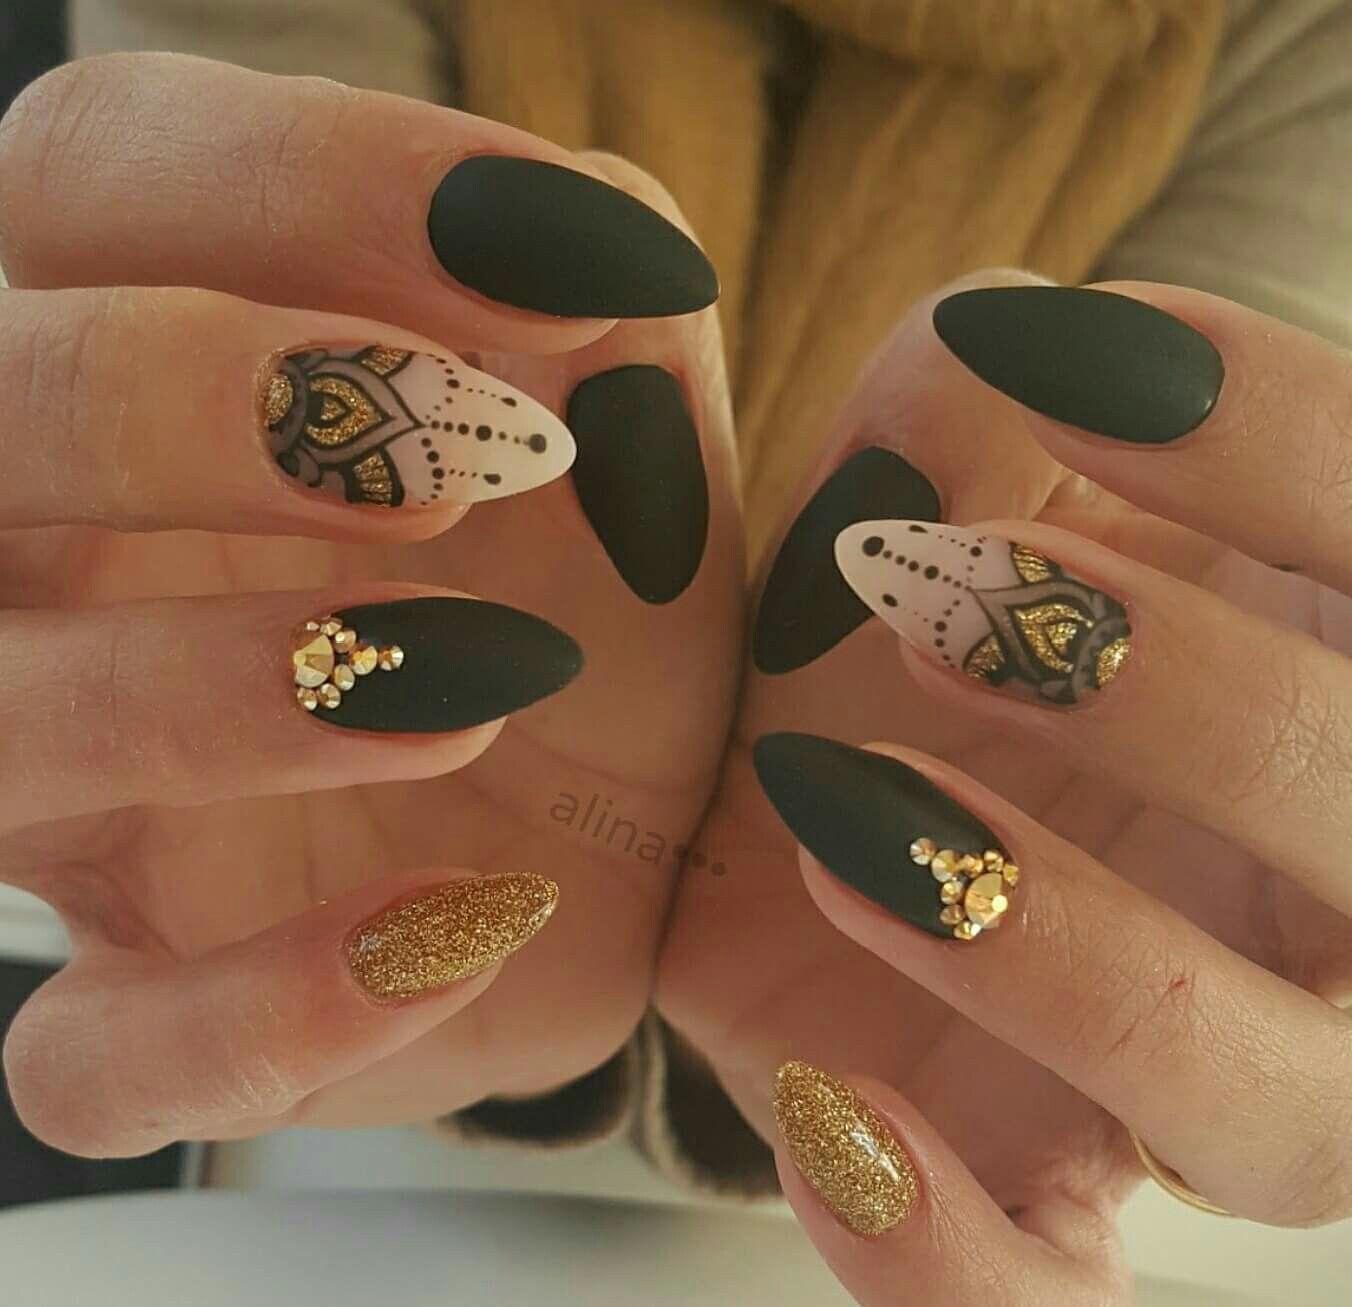 Pin de maggie stewart en Nail art | Pinterest | Arte uñas, Diseños ...